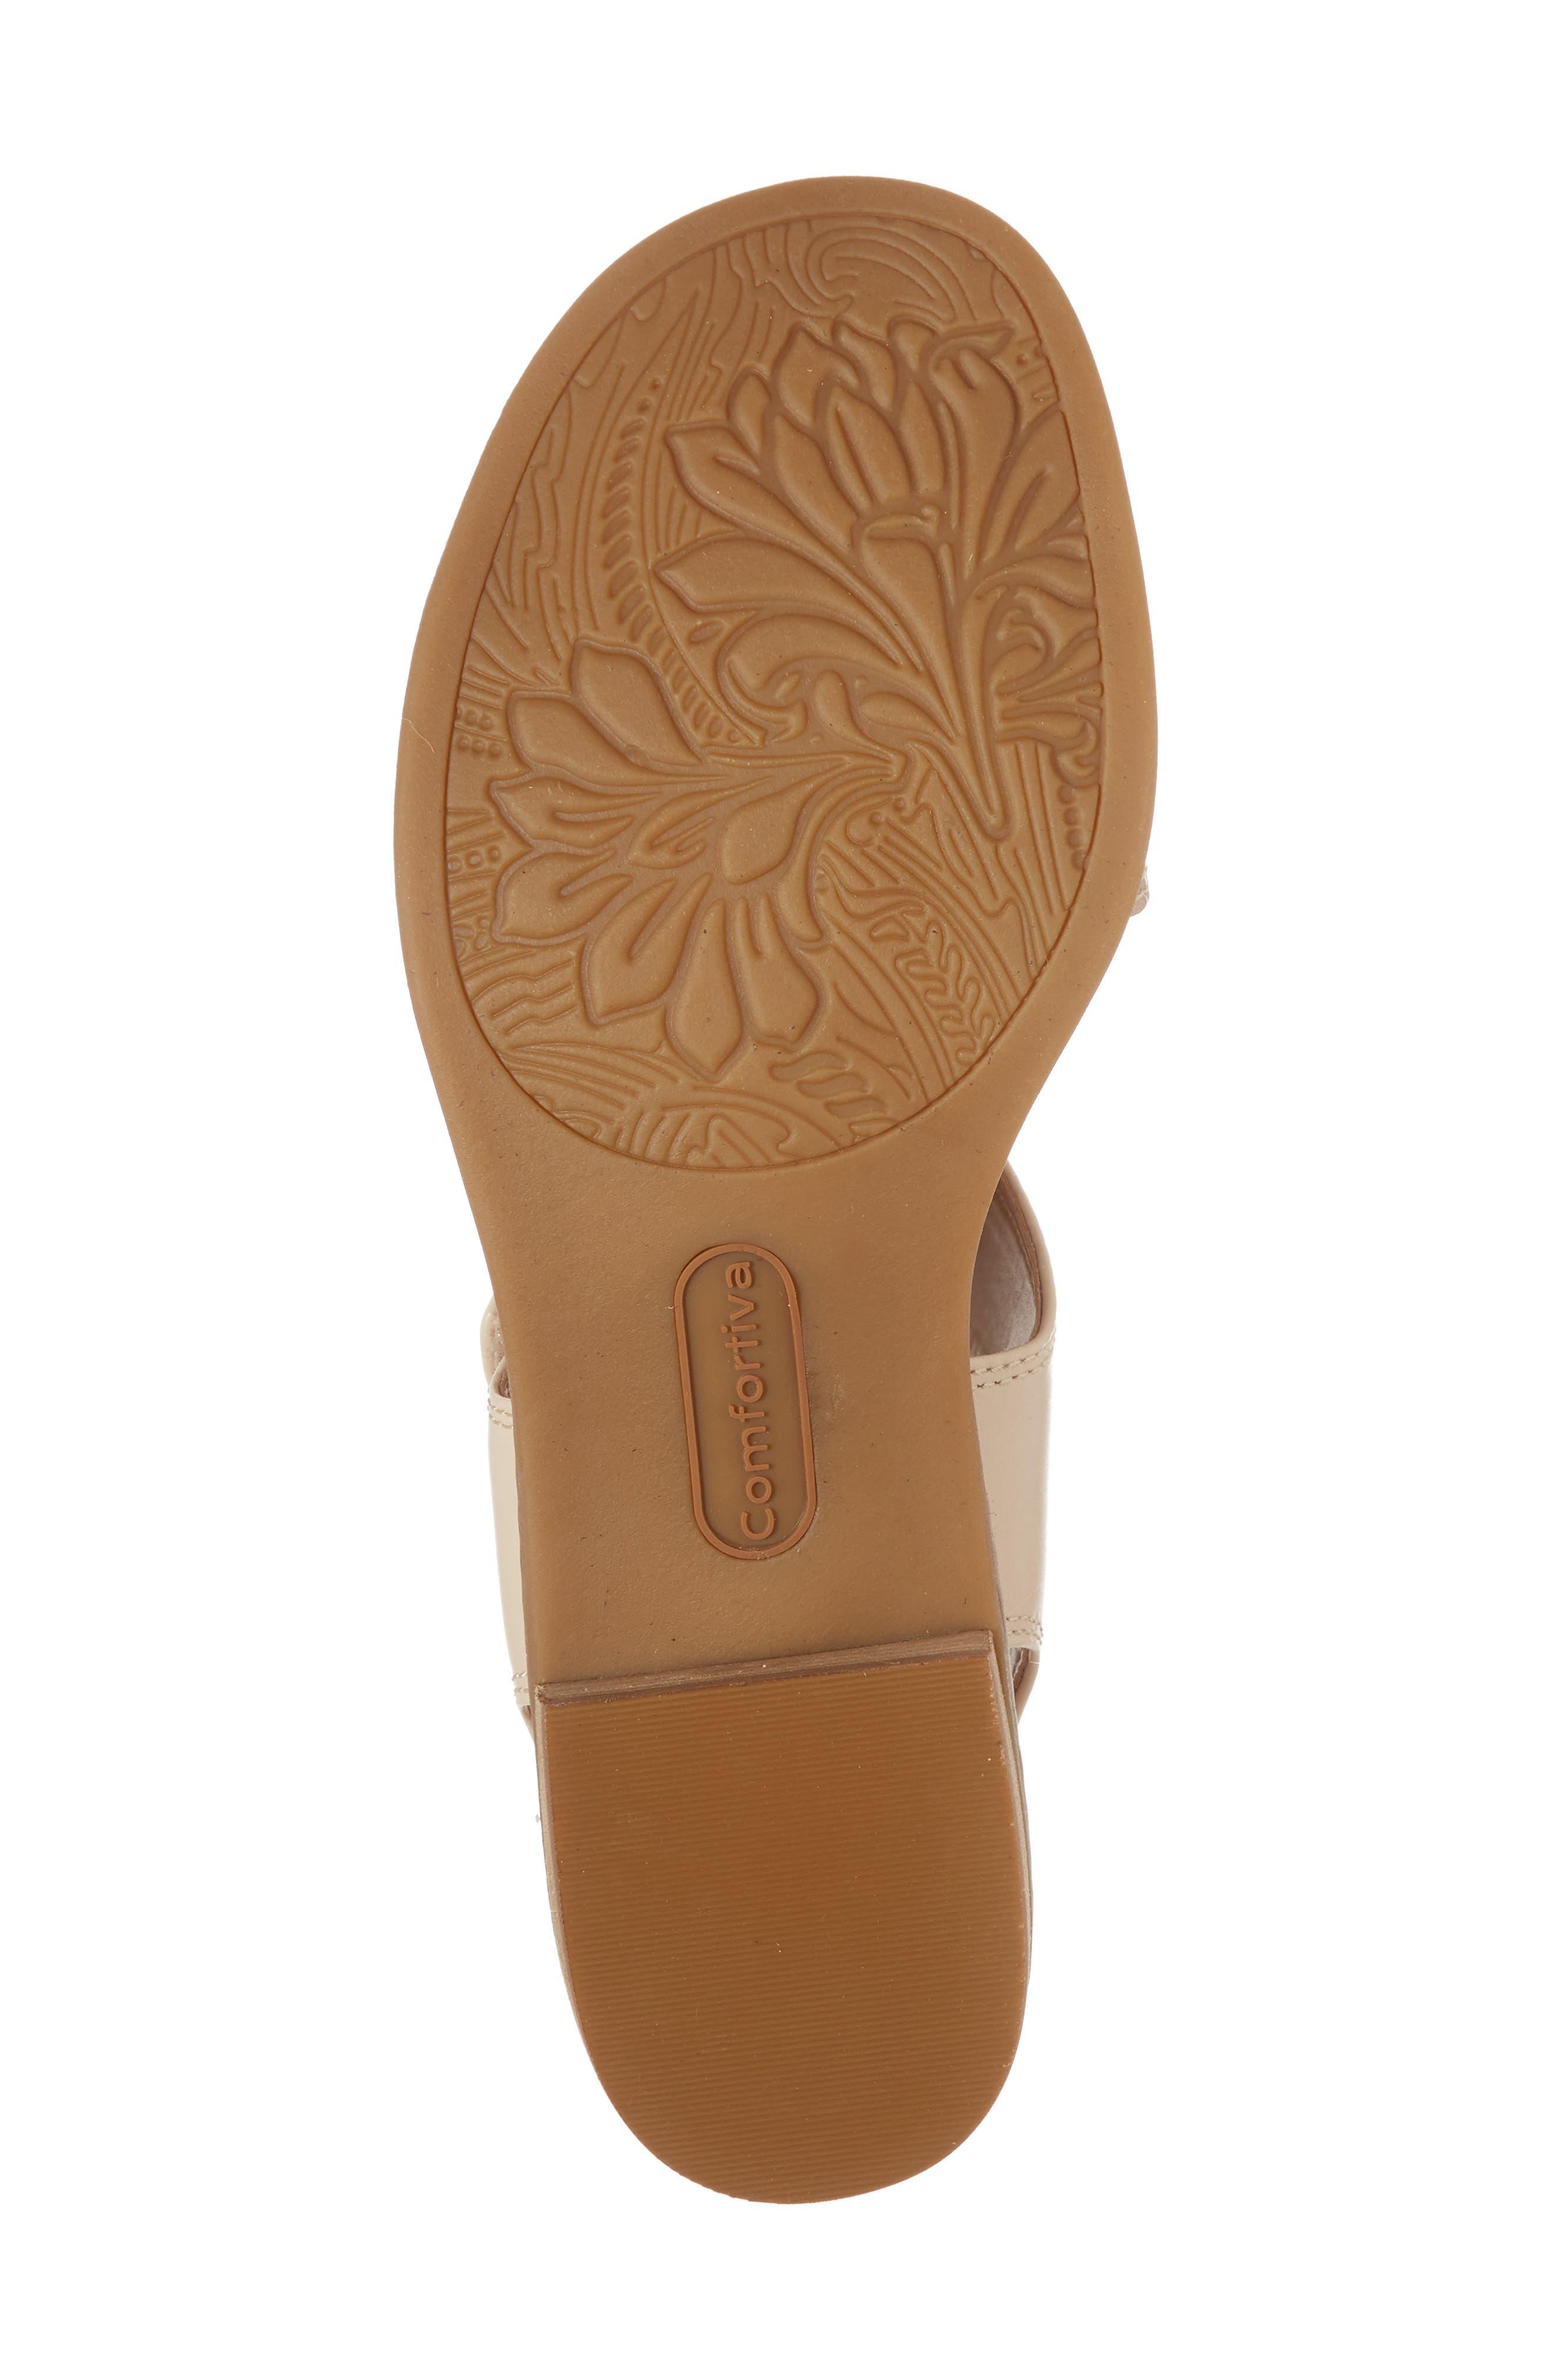 Baja Sandal,                             Alternate thumbnail 6, color,                             Champagne/ Beige Leather